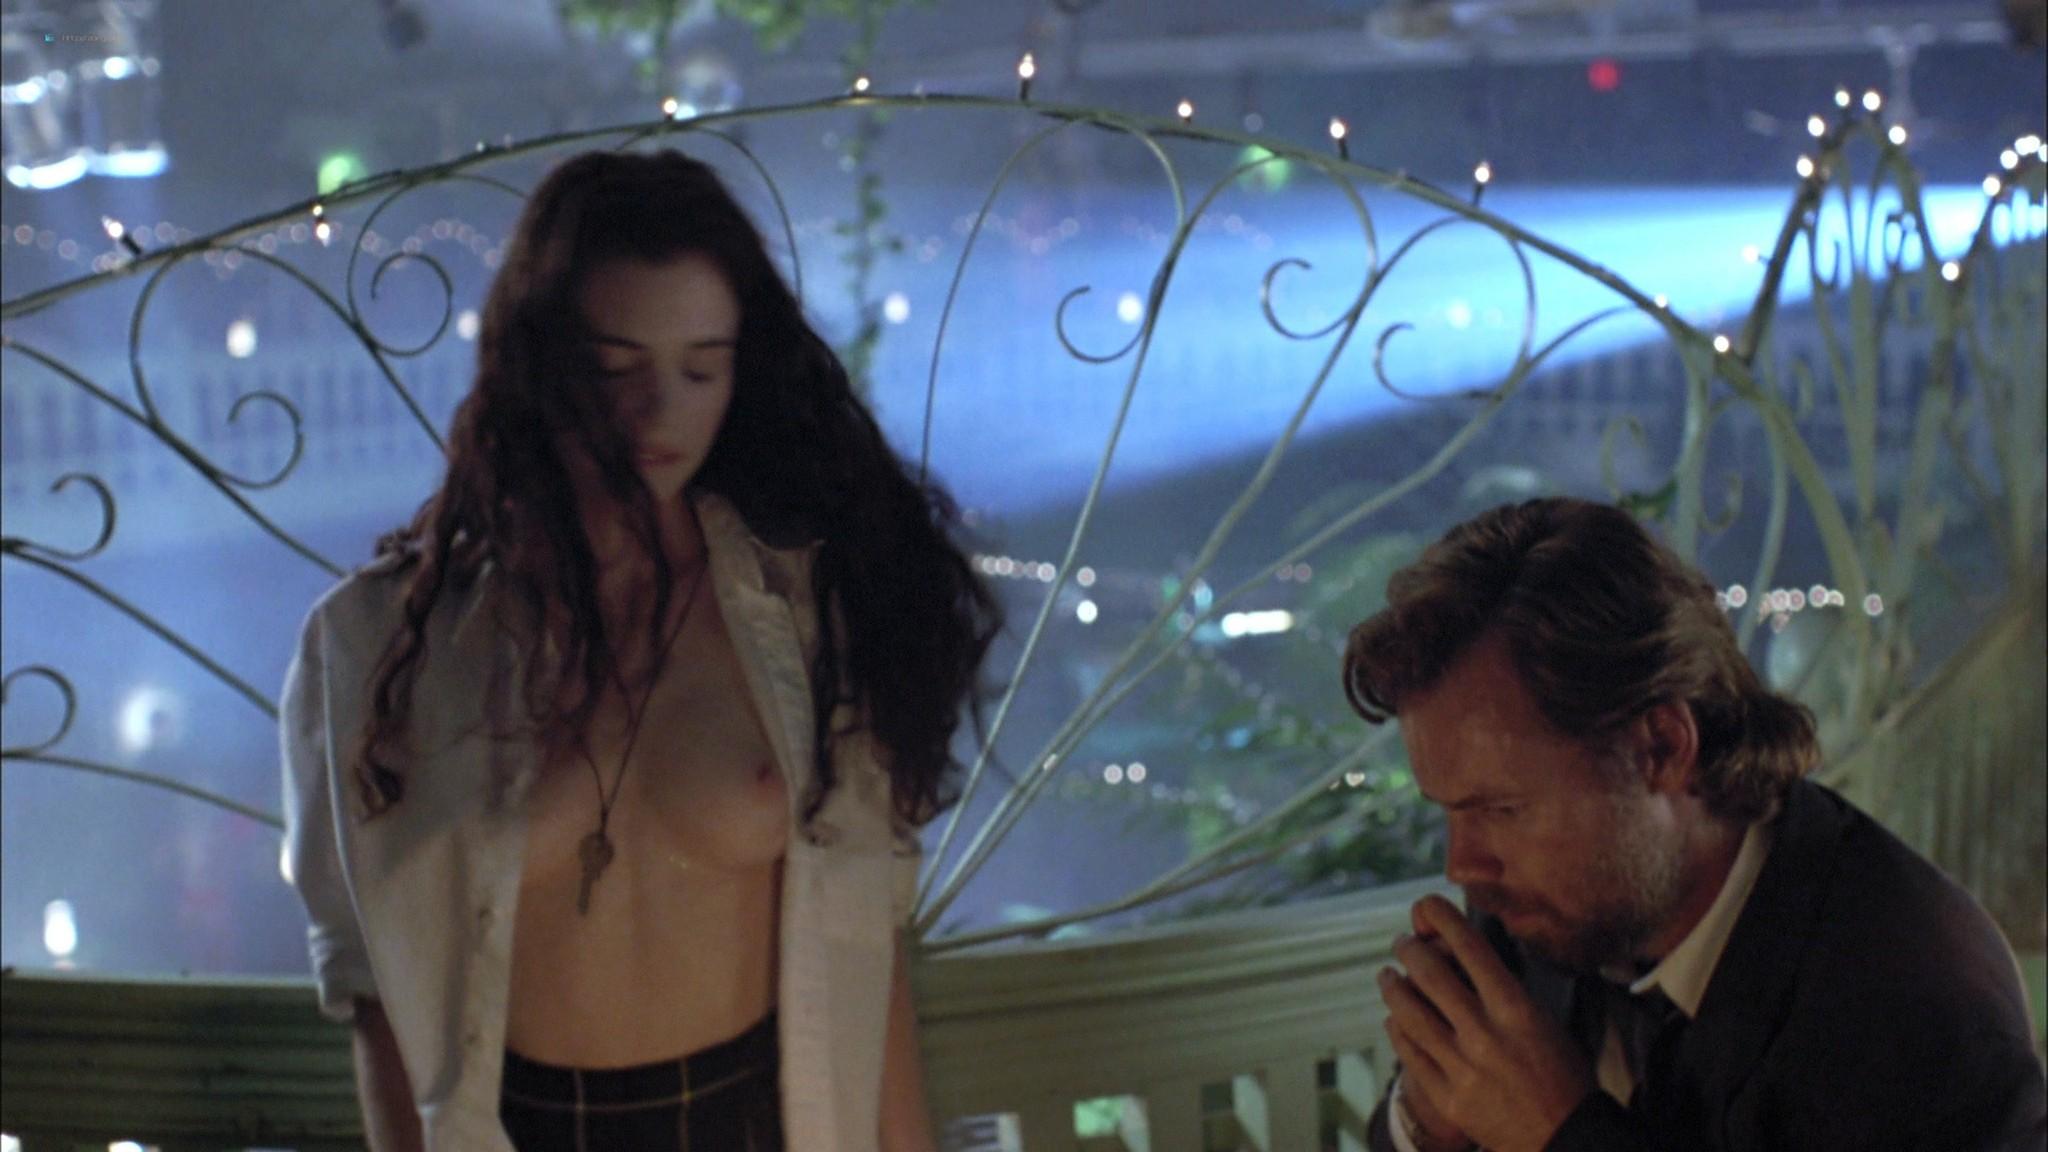 Mia Kirshner nude Arsinée Khanjian sexy - Exotica (1994) HD 1080p BluRay REMUX (7)